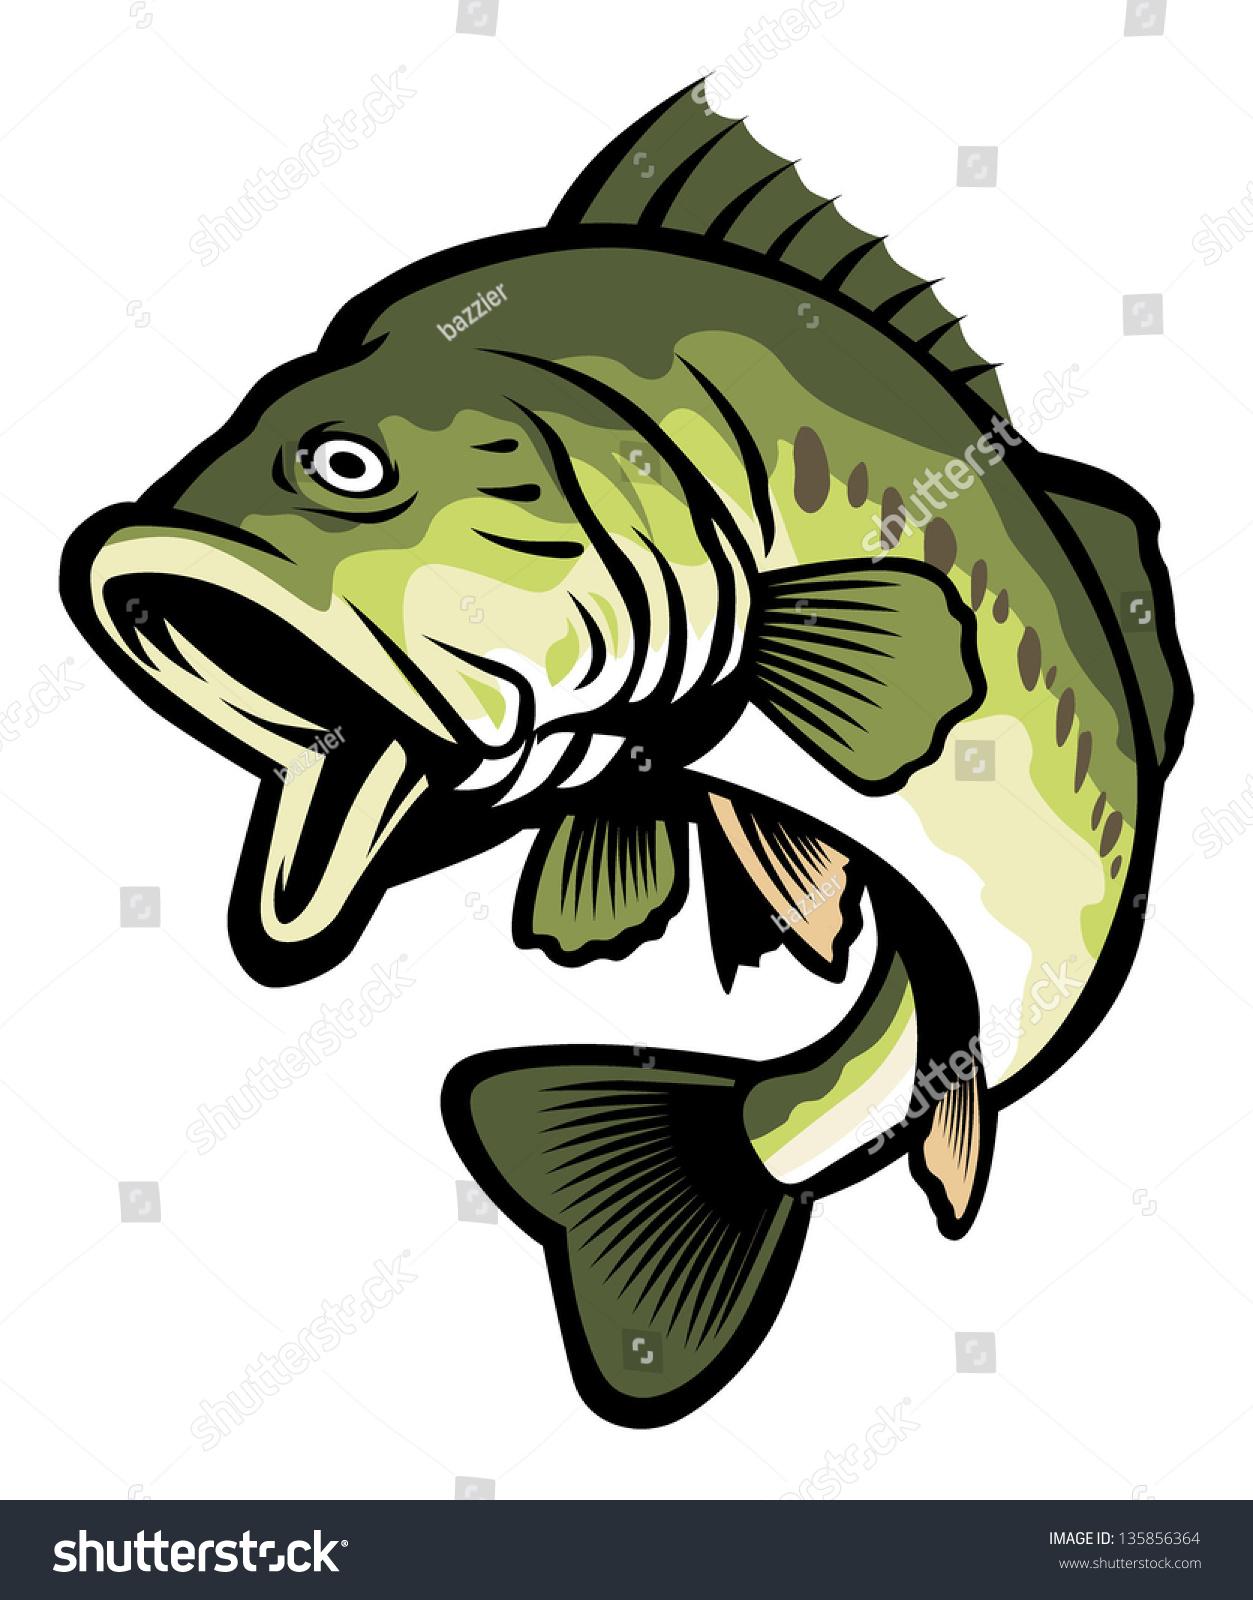 Freshwater fish clipart - Freshwater Fish